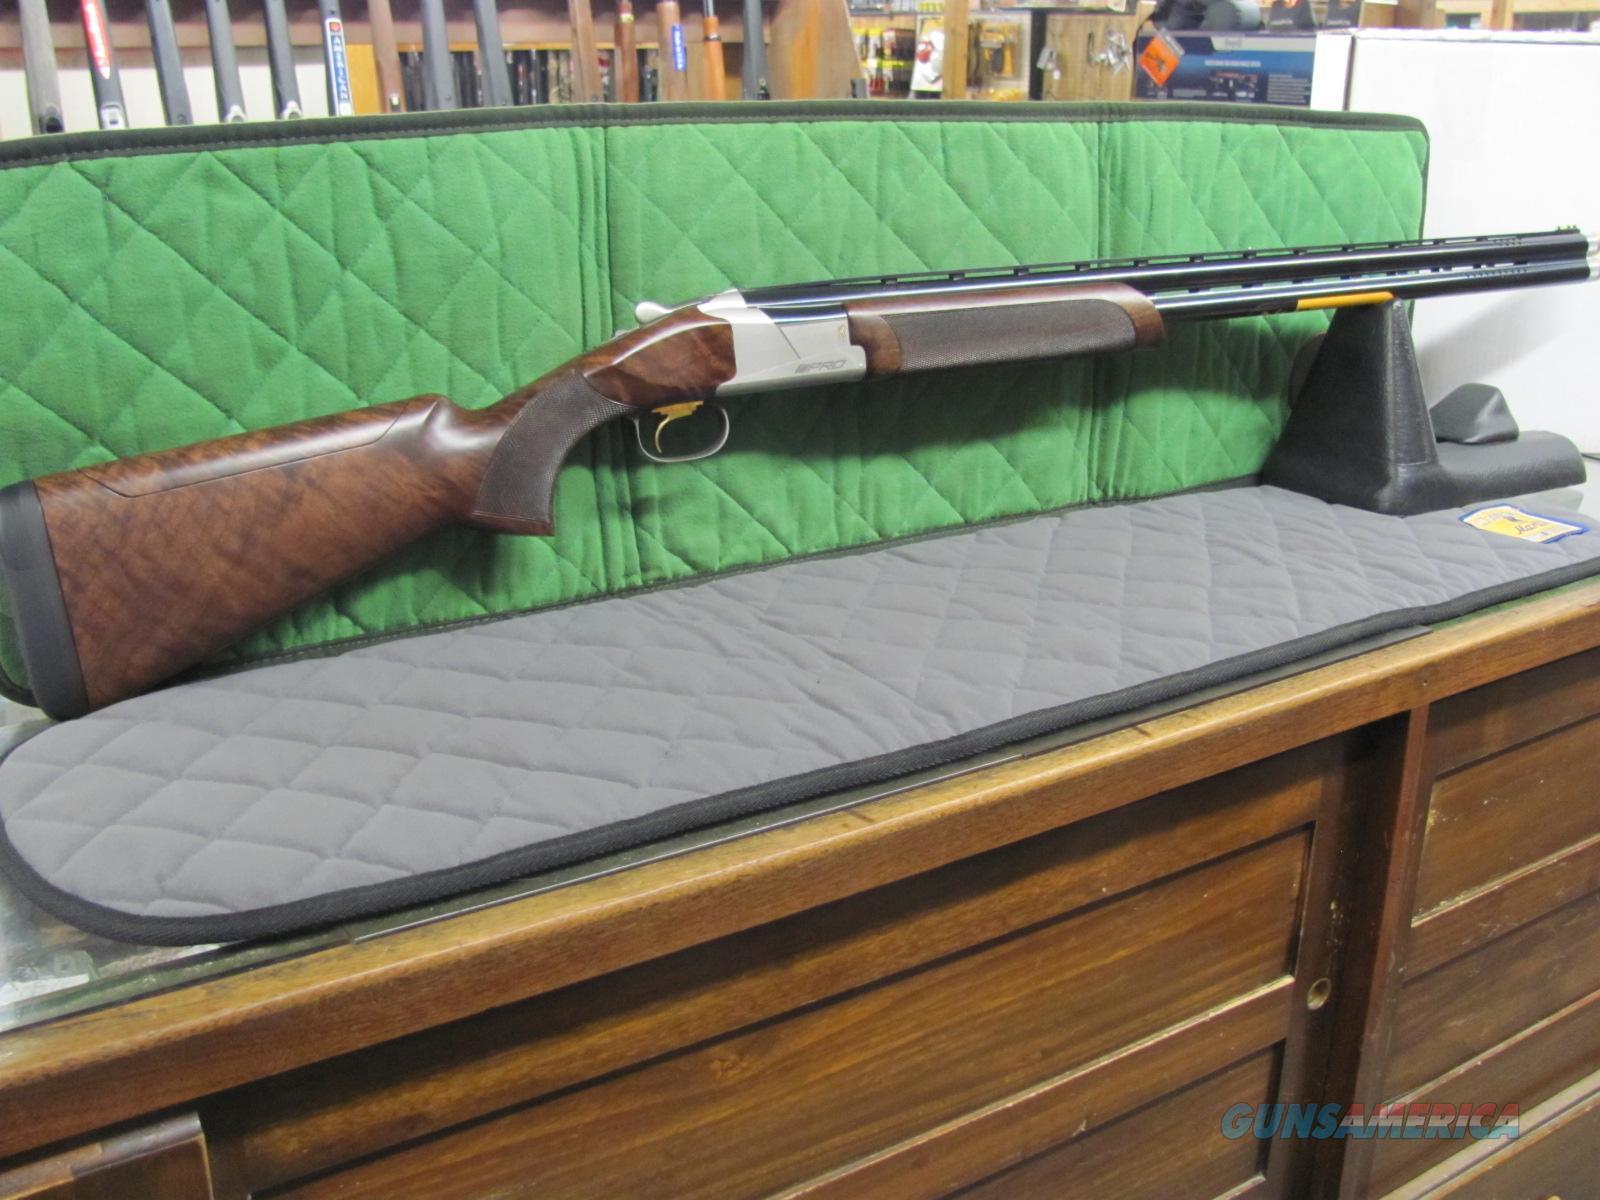 Browning Citori 725 Pro Sporting Adj Comb 12 ga 30 Inch  **NO CC FEES** 0180024010  Guns > Shotguns > Browning Shotguns > Over Unders > Citori > Trap/Skeet